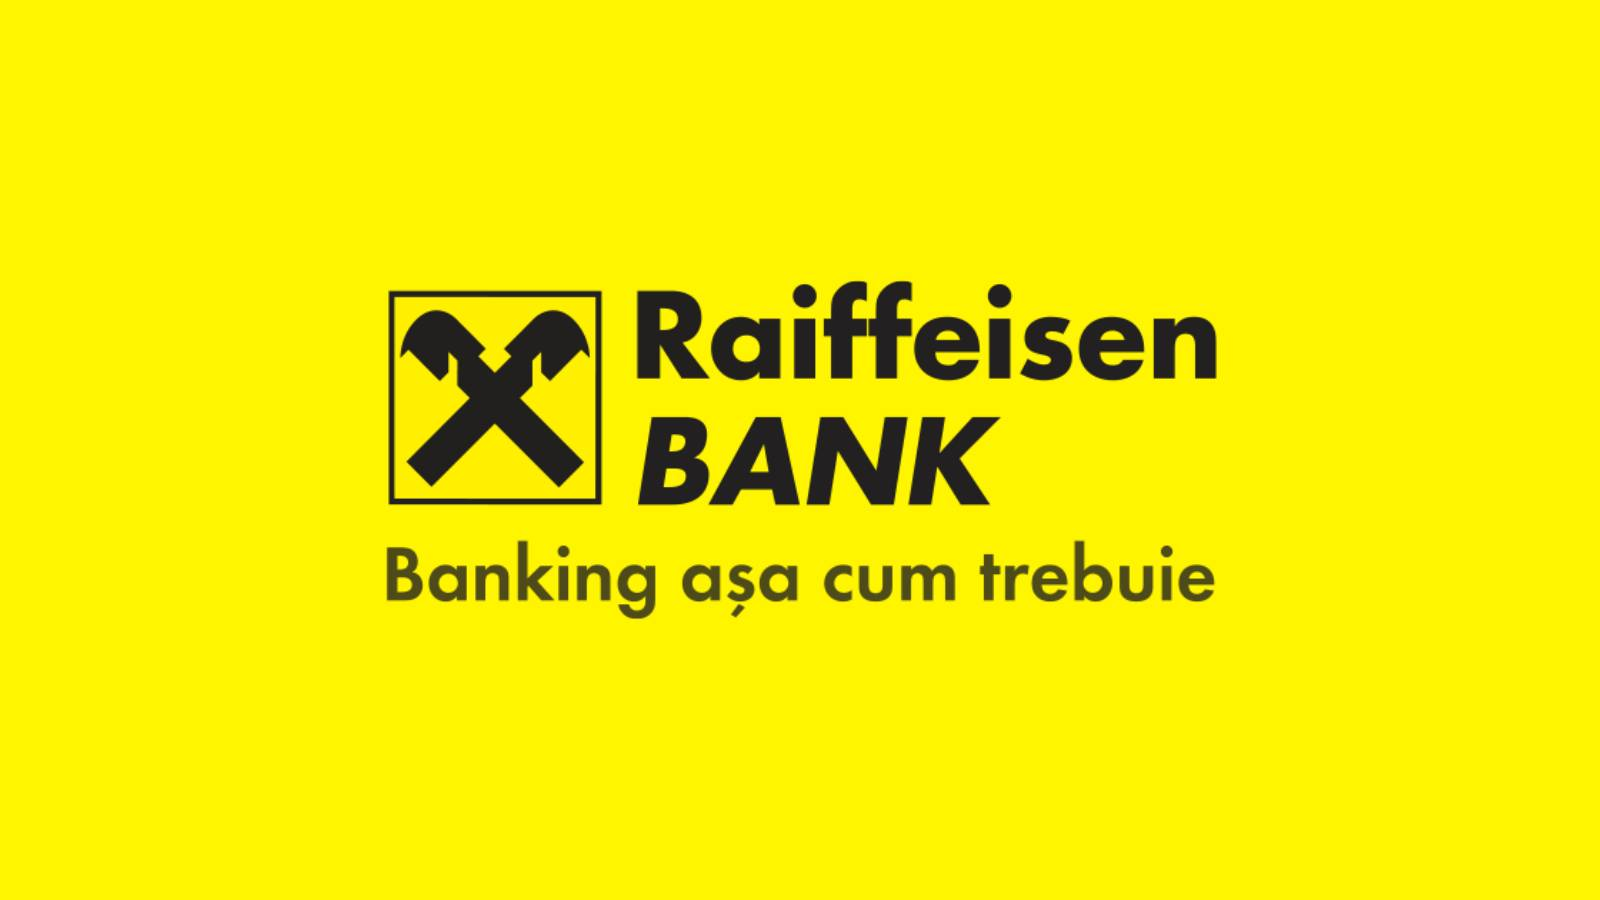 Raiffeisen Bank inrolare